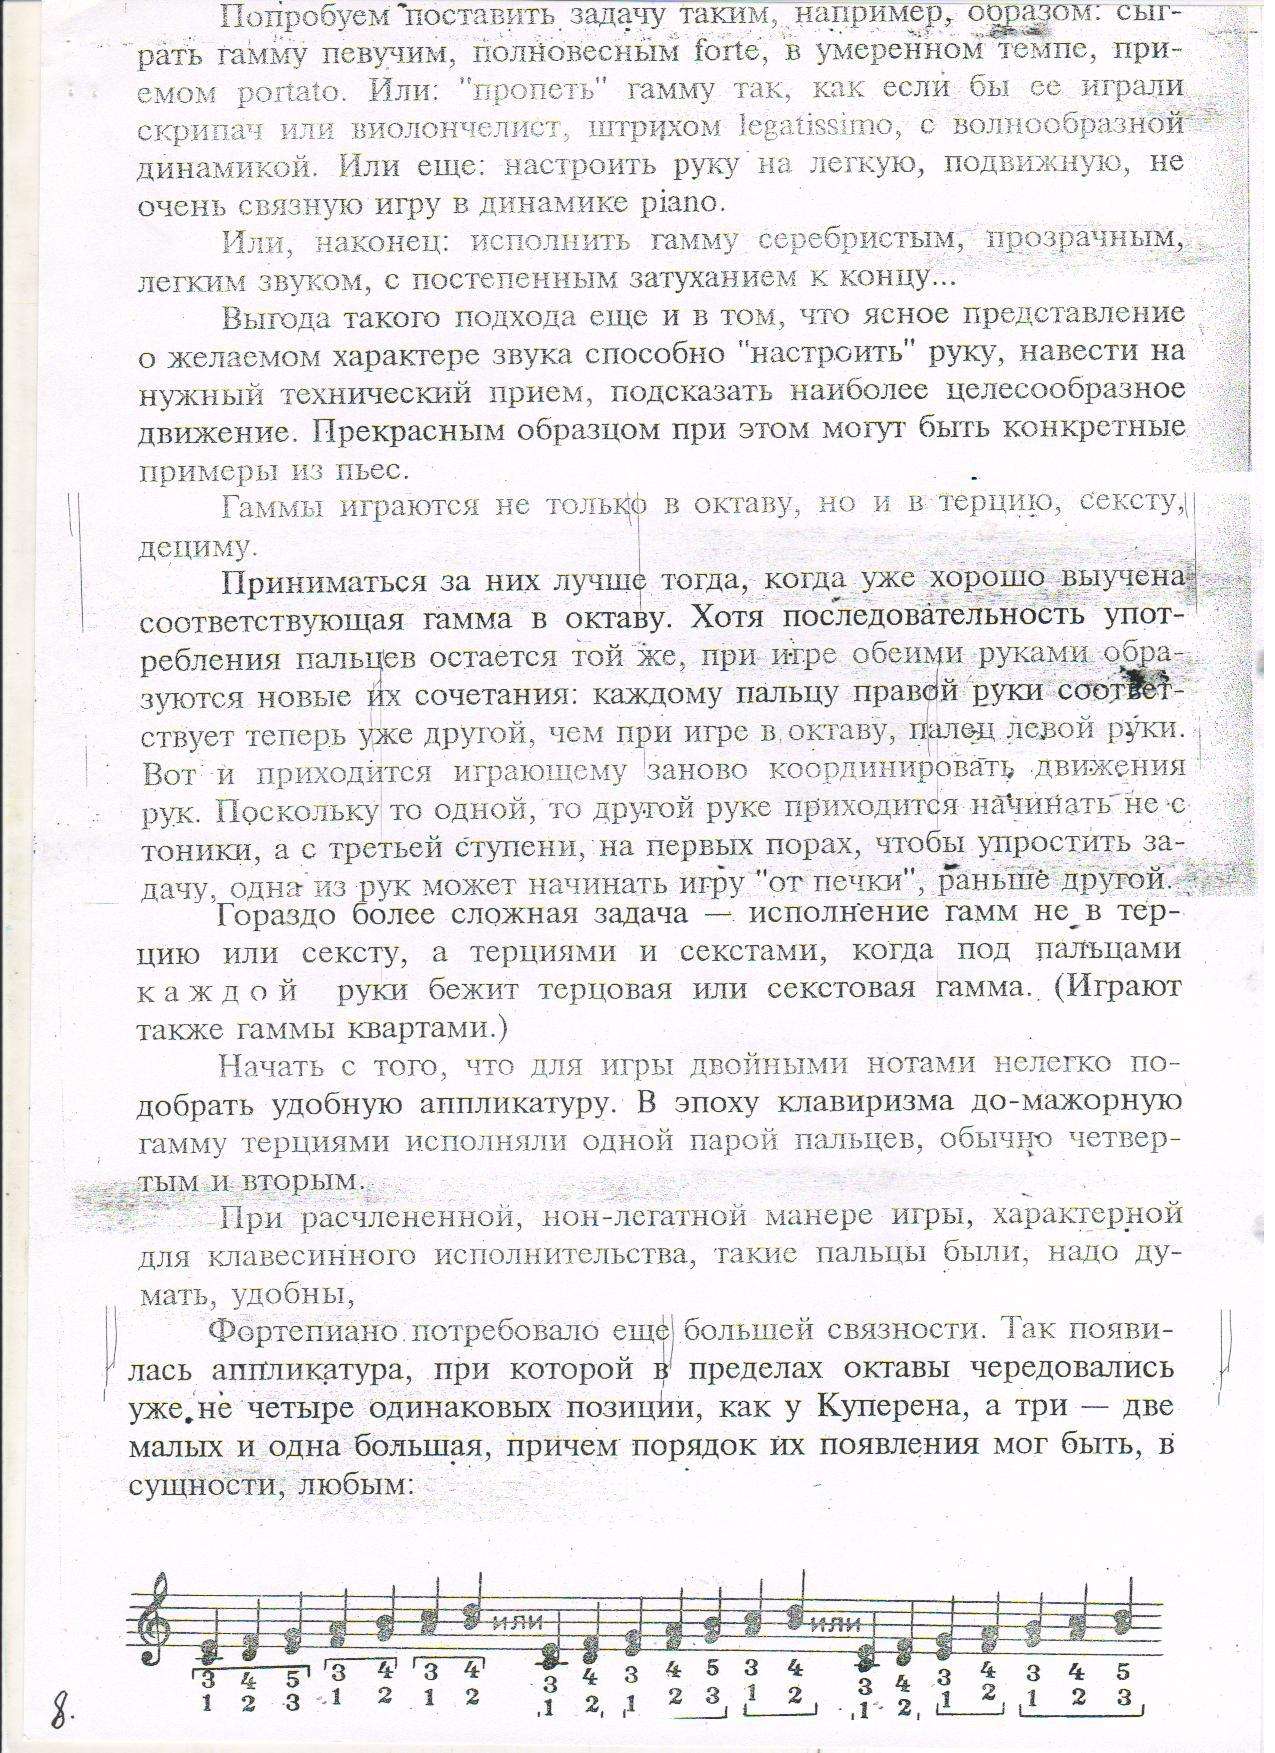 C:\Documents and Settings\Учитель\Рабочий стол\гаммы 10.jpg